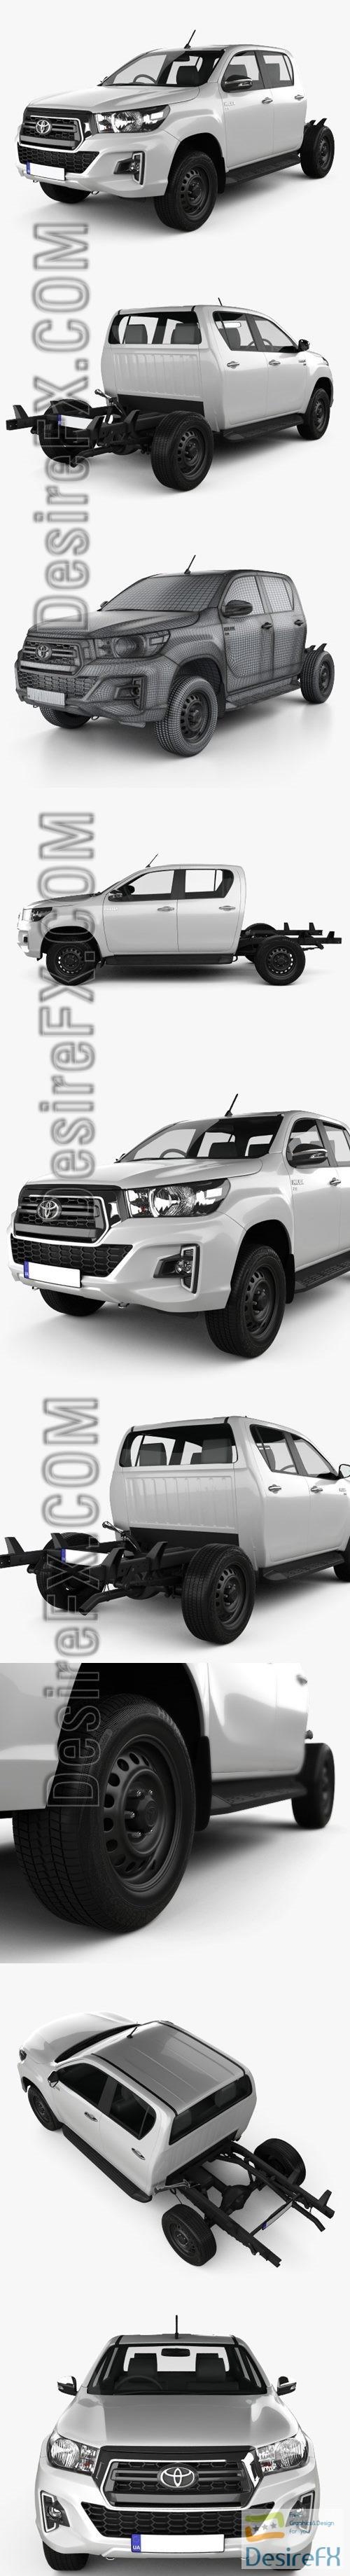 3d-models - Toyota Hilux Double Cab Chassis SR 2019 3D Model